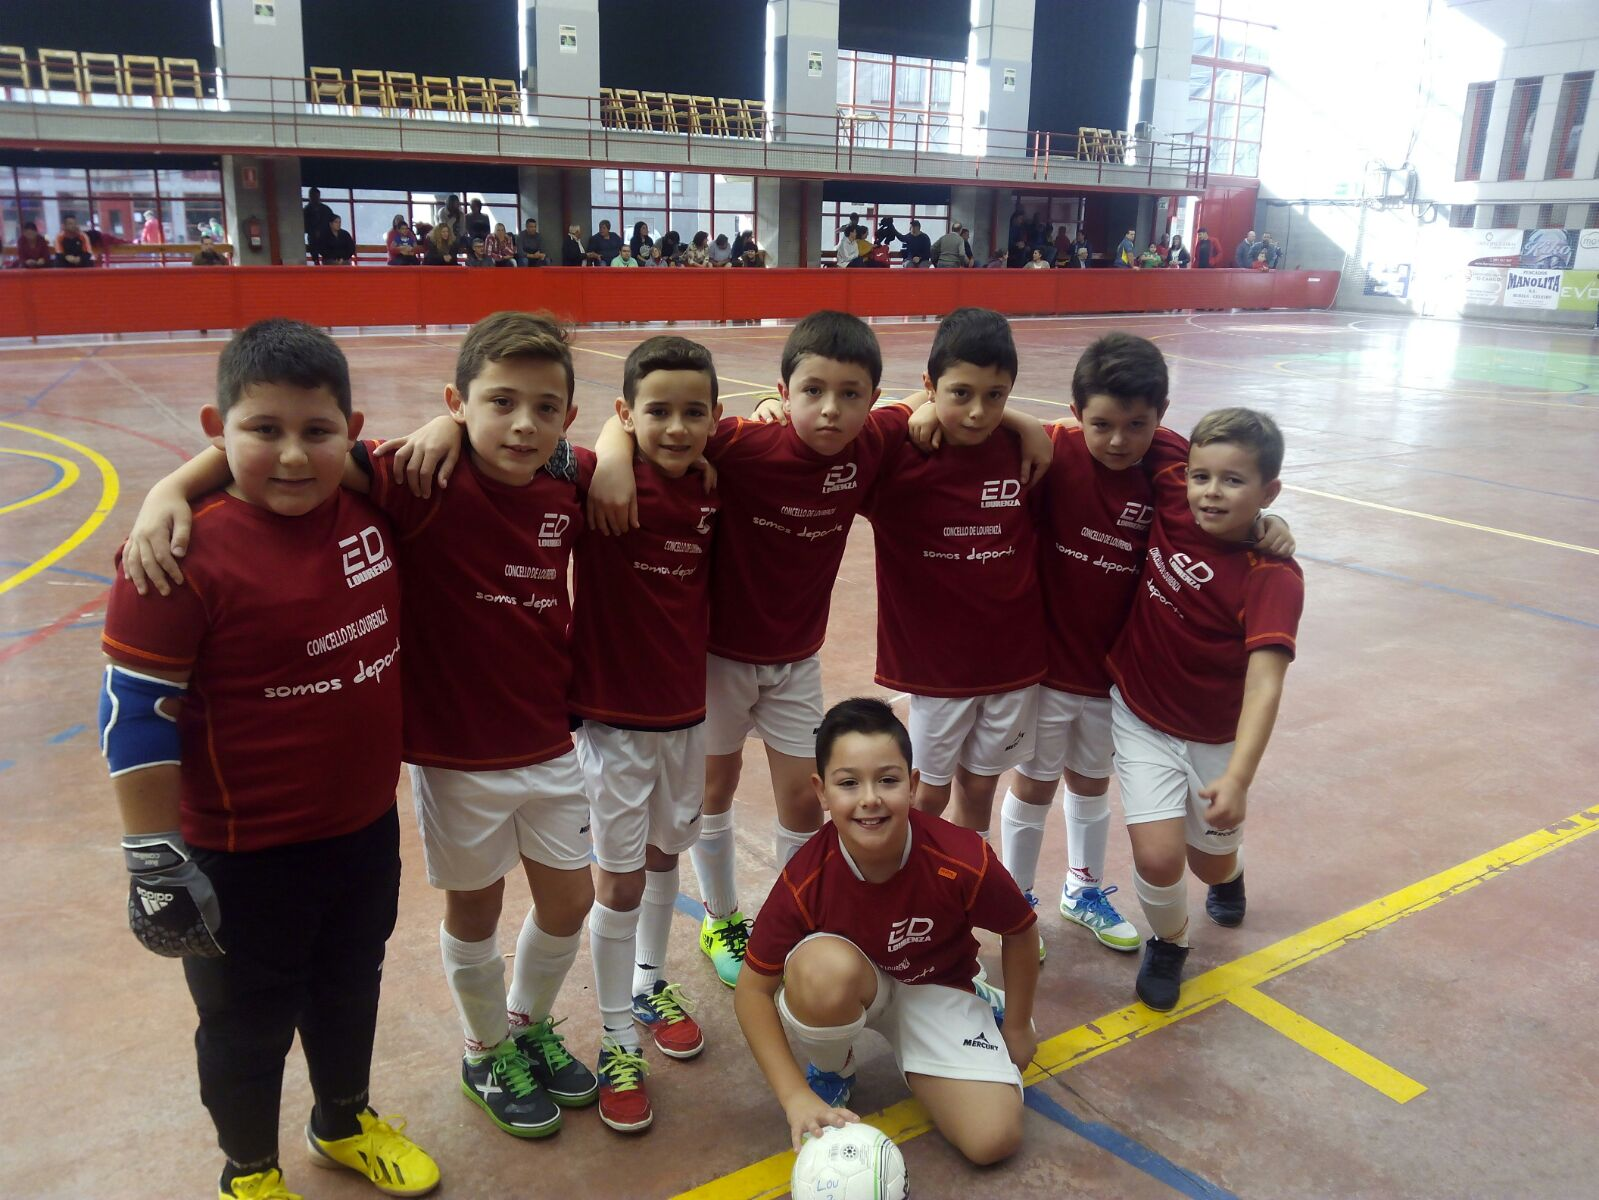 Escolas Deportivas Lourenz F Sala Victoria En Ribadeo Do  # Muebles Huertas Lourenza